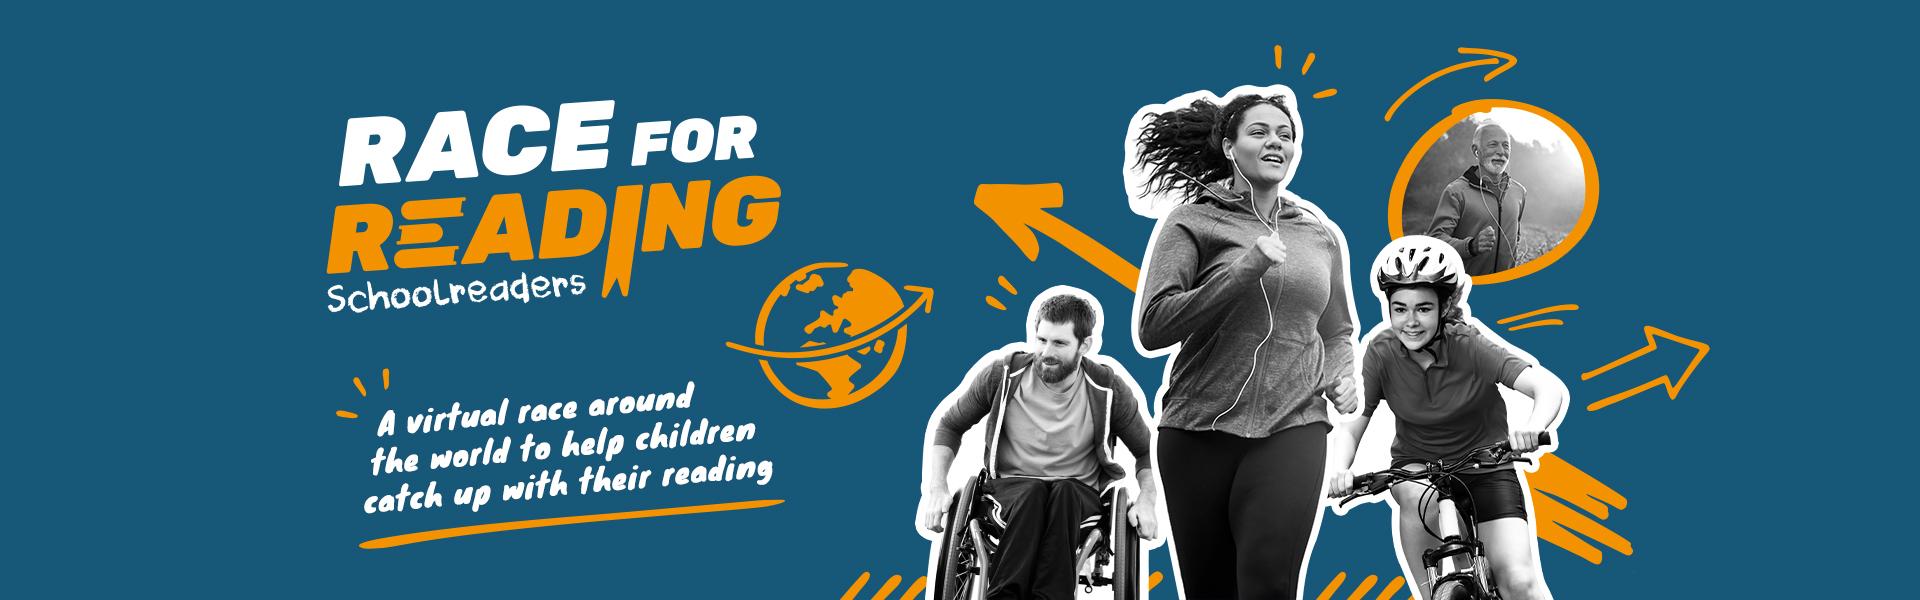 Schoolreaders Race for Reading banner